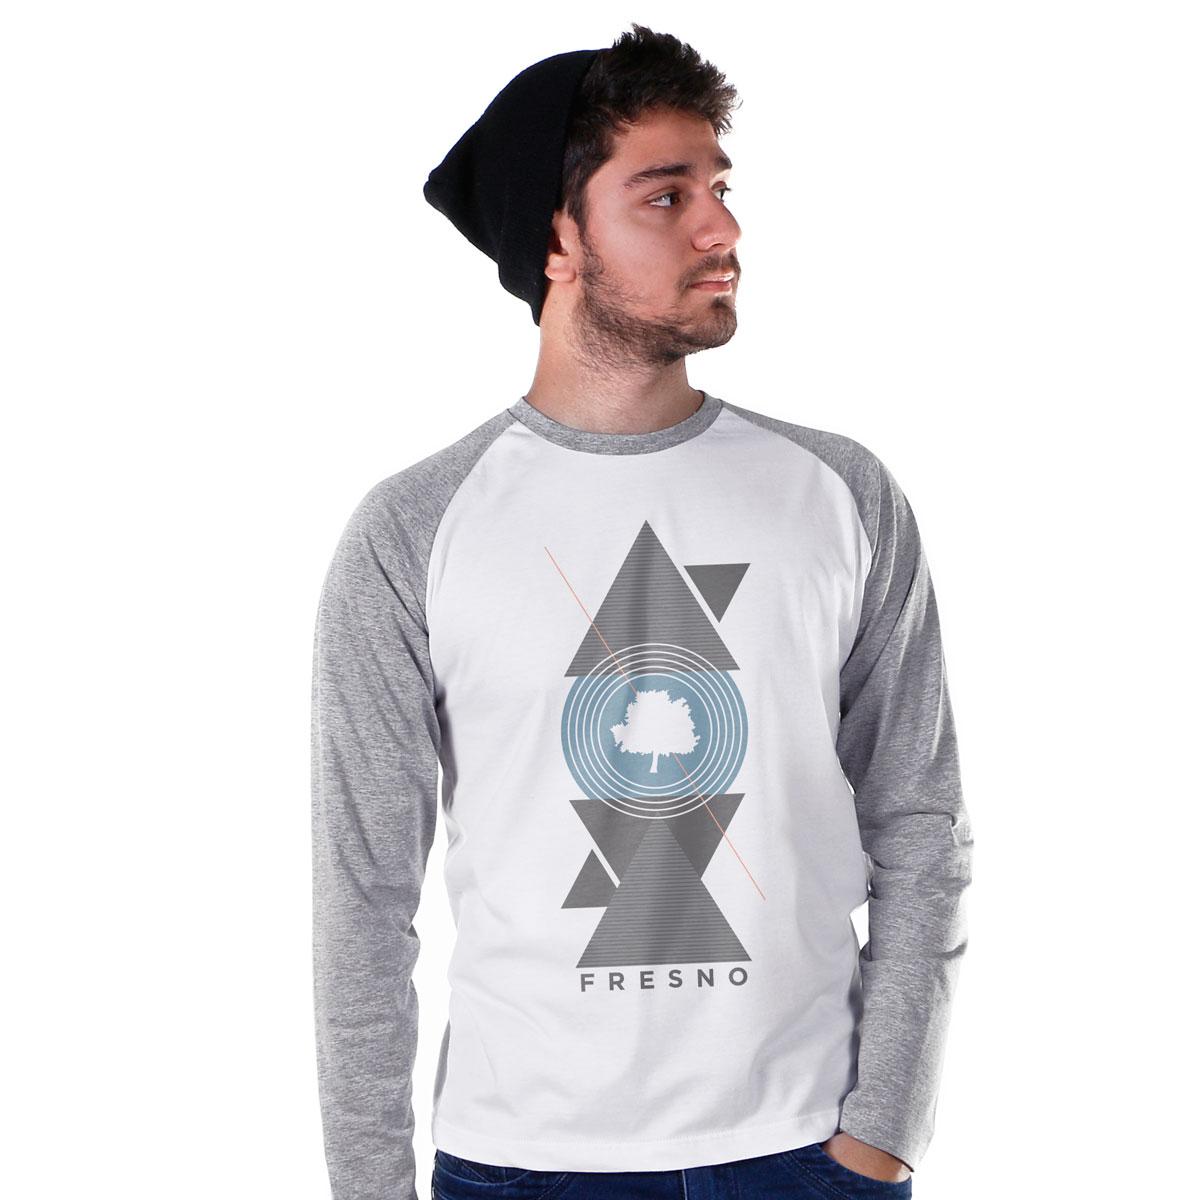 Camiseta Raglan Masculina Fresno Geometric